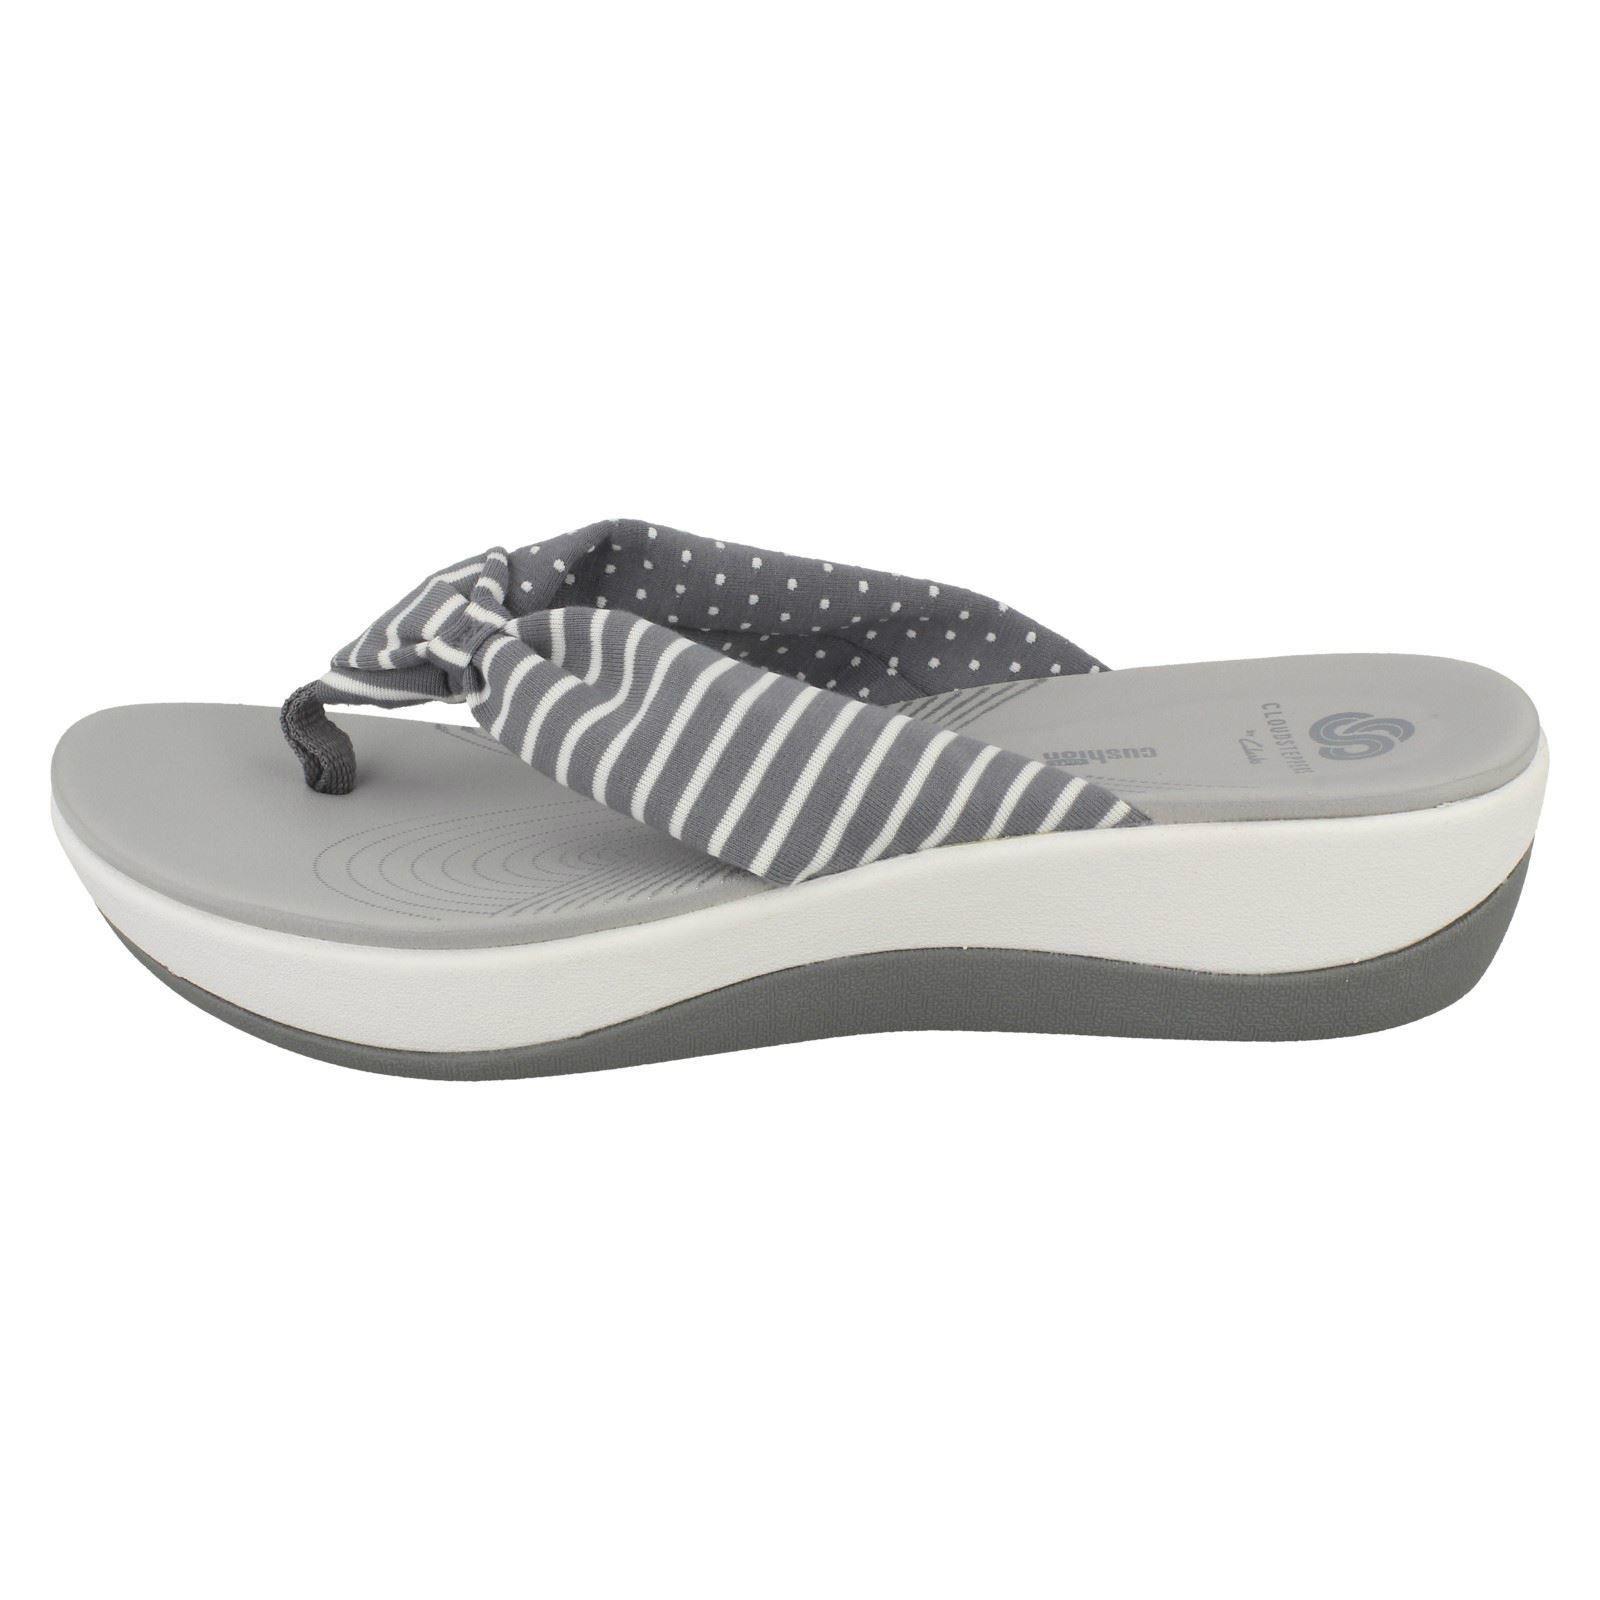 de474b840aac Ladies Clarks Cloudsteppers Toe Post Summer Sandals  Arla Glison 18 ...